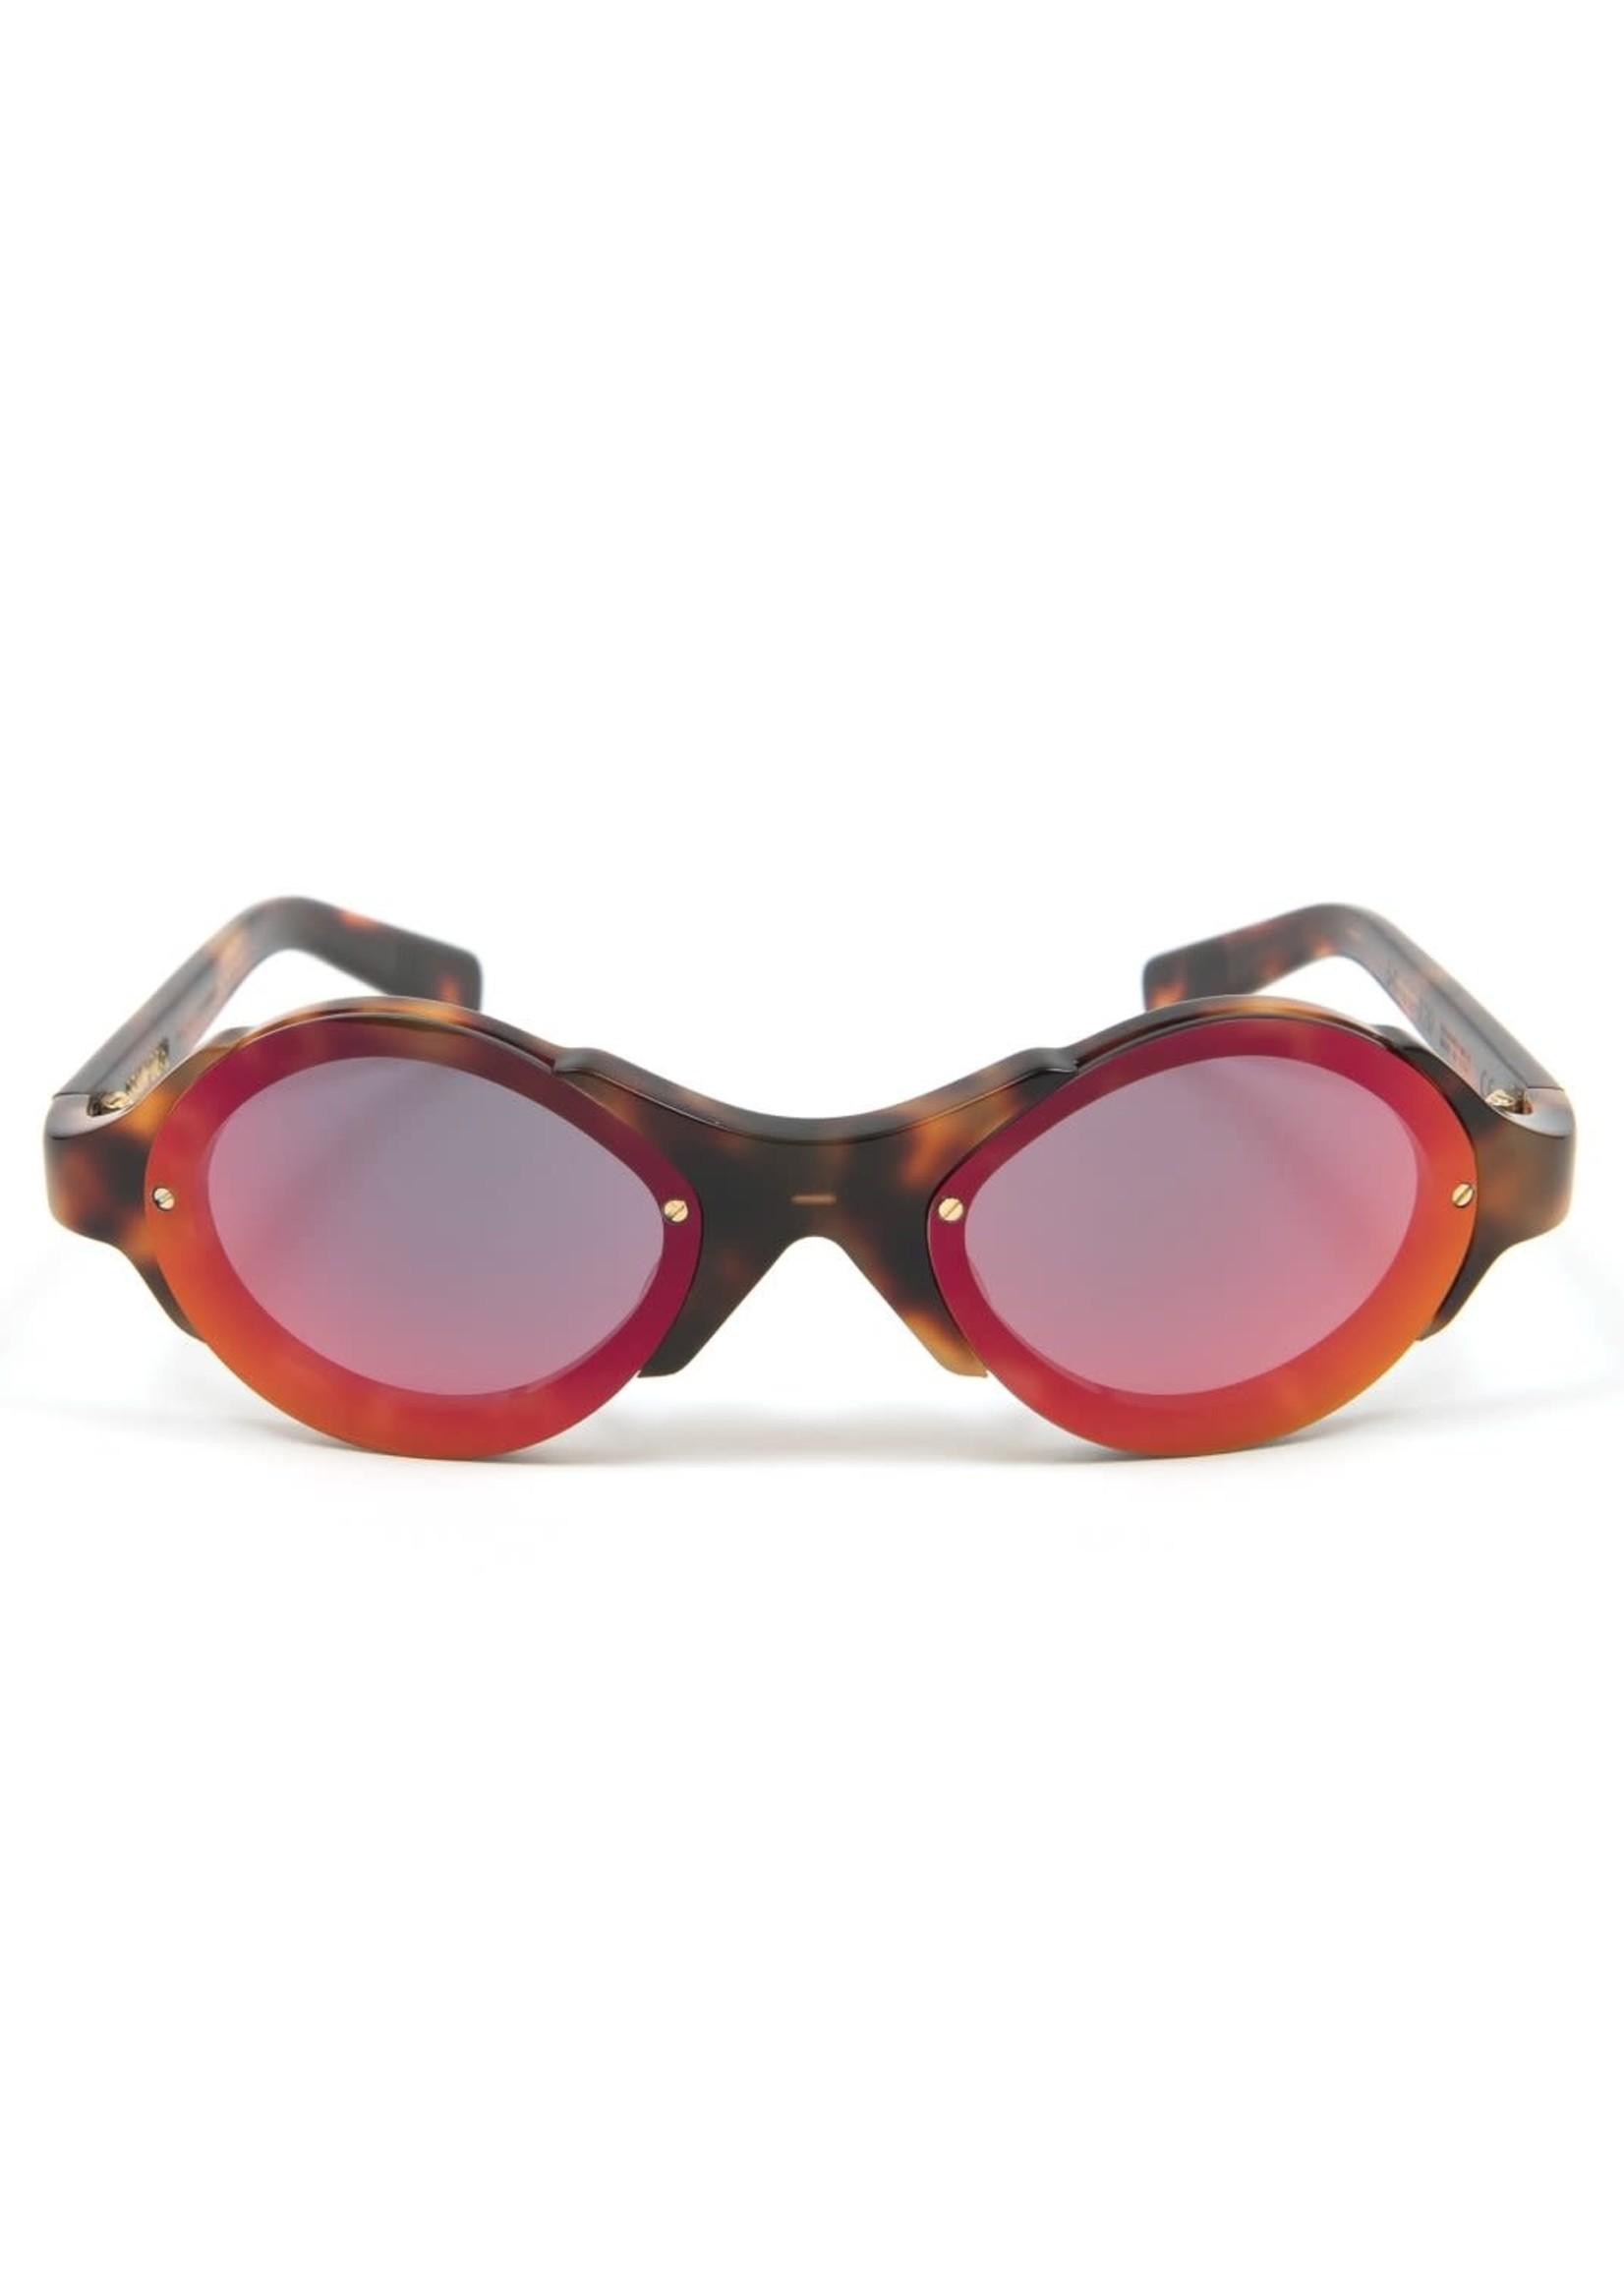 Brain Dead Mutant Sunglasses in Brown Tortoise / Red Reflective